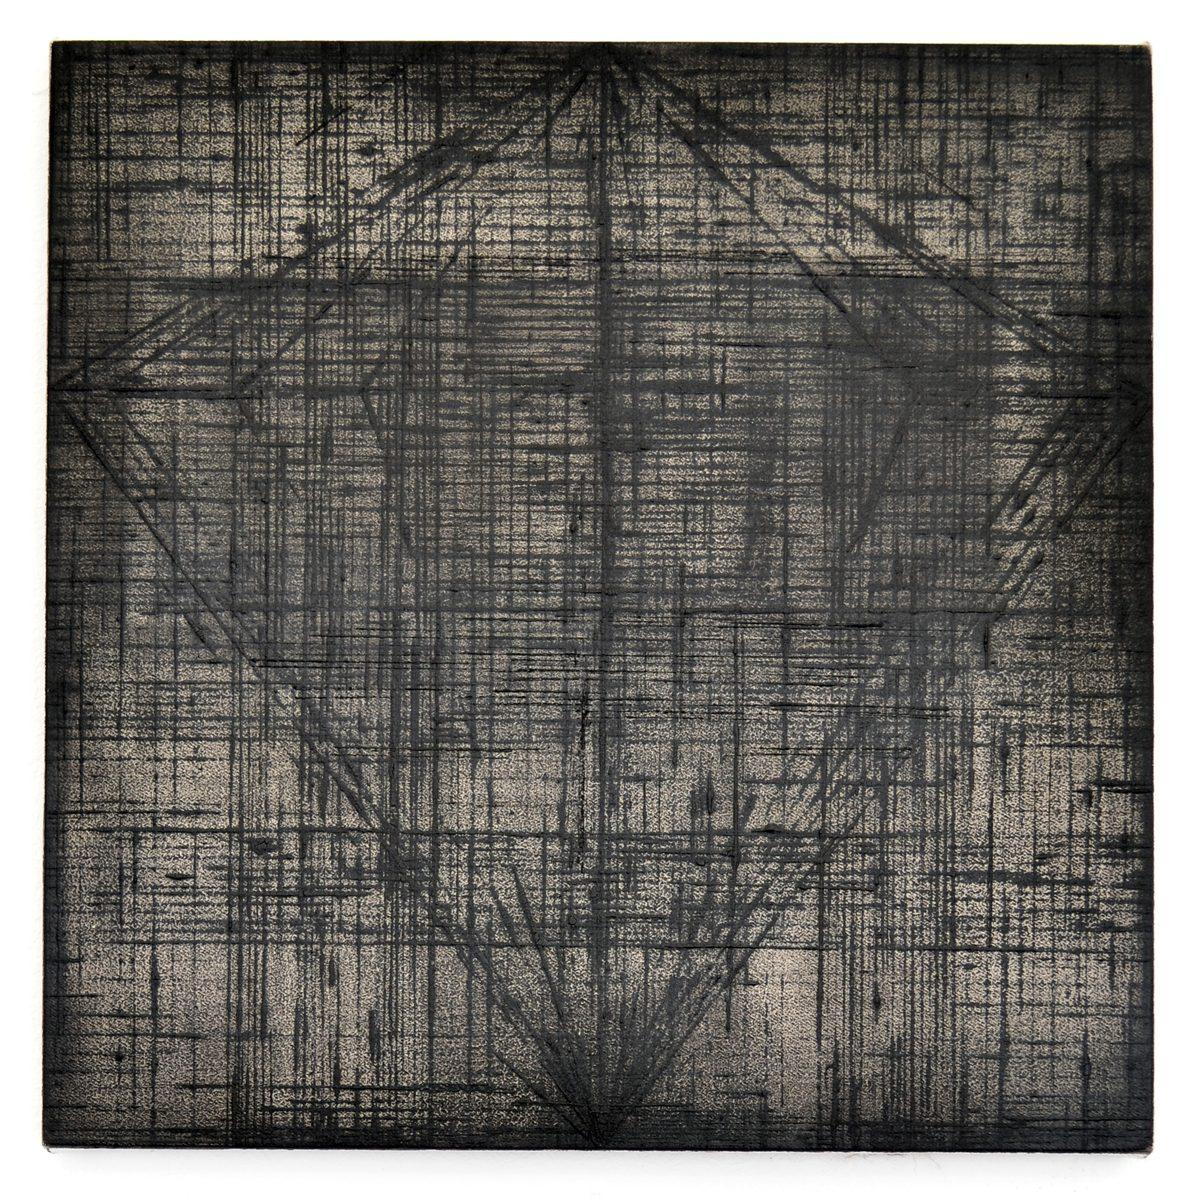 Rieko Hotta, Obelisk Series 2, 2017. Tempera on cotton canvas, 30 x 30 cm